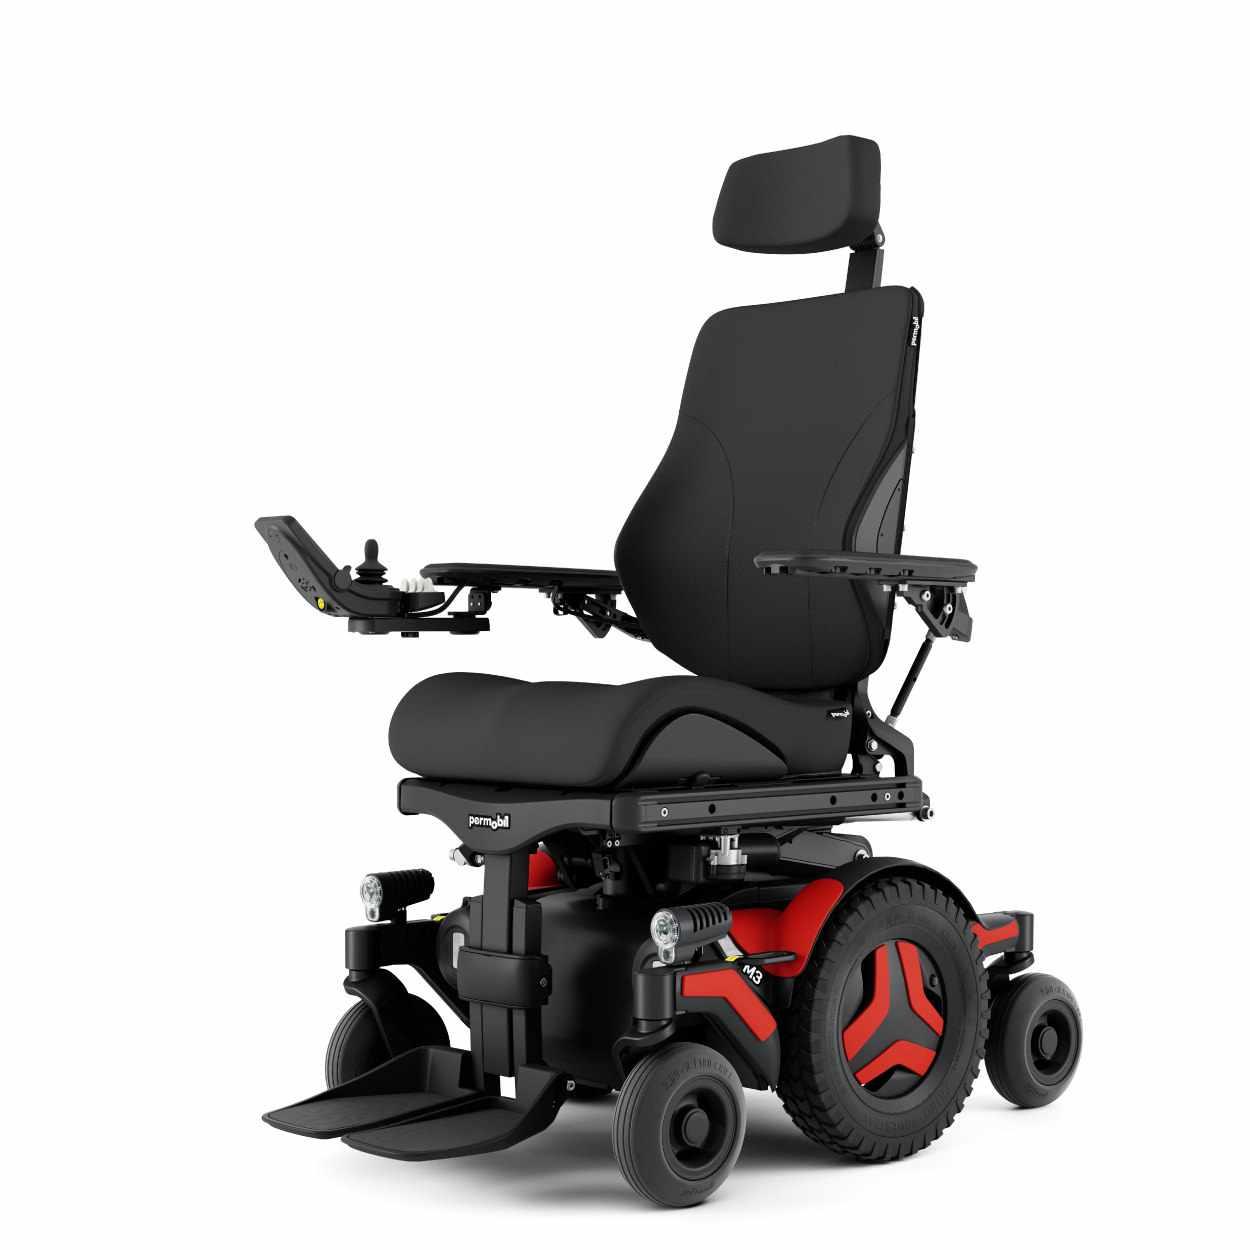 Permobil M3 Corpus Power Wheelchair | Permobil Mid Wheel Drive